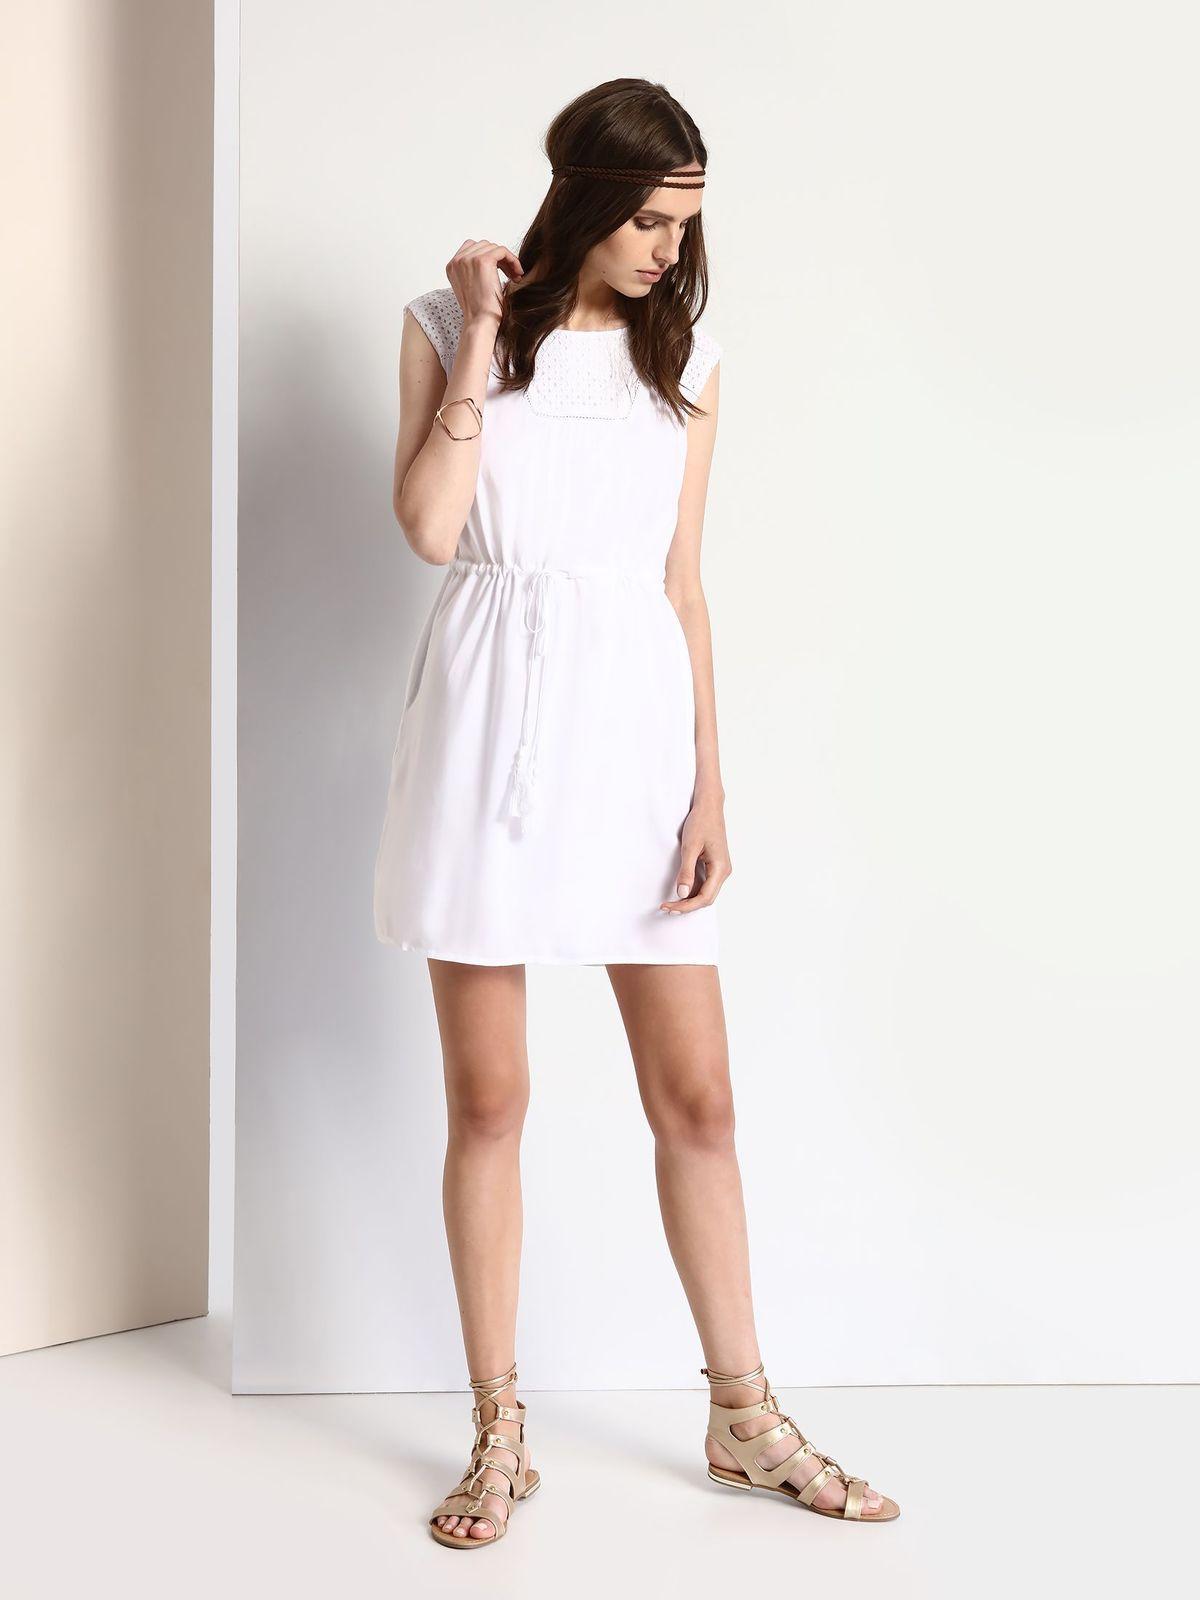 TOP SECRET φορεμα boho style